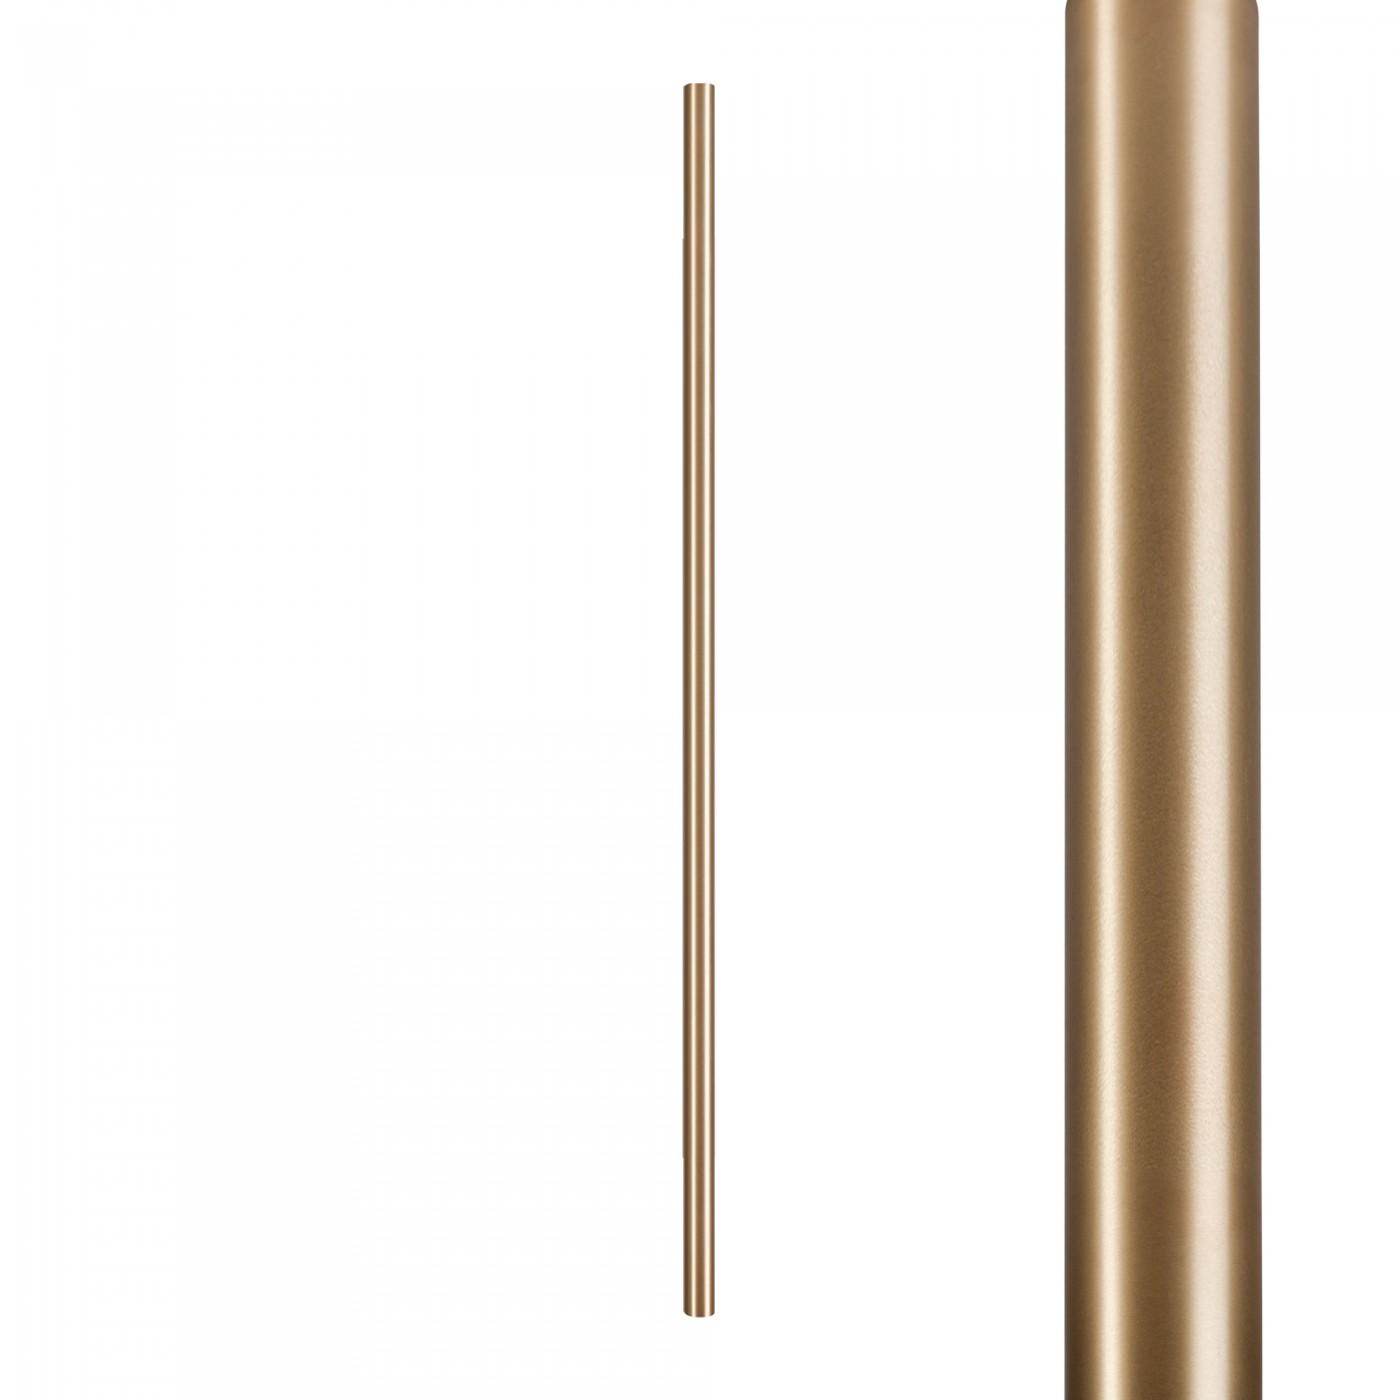 CAMELEON LASER 1000 BS 8486 Nowodvorski Lighting